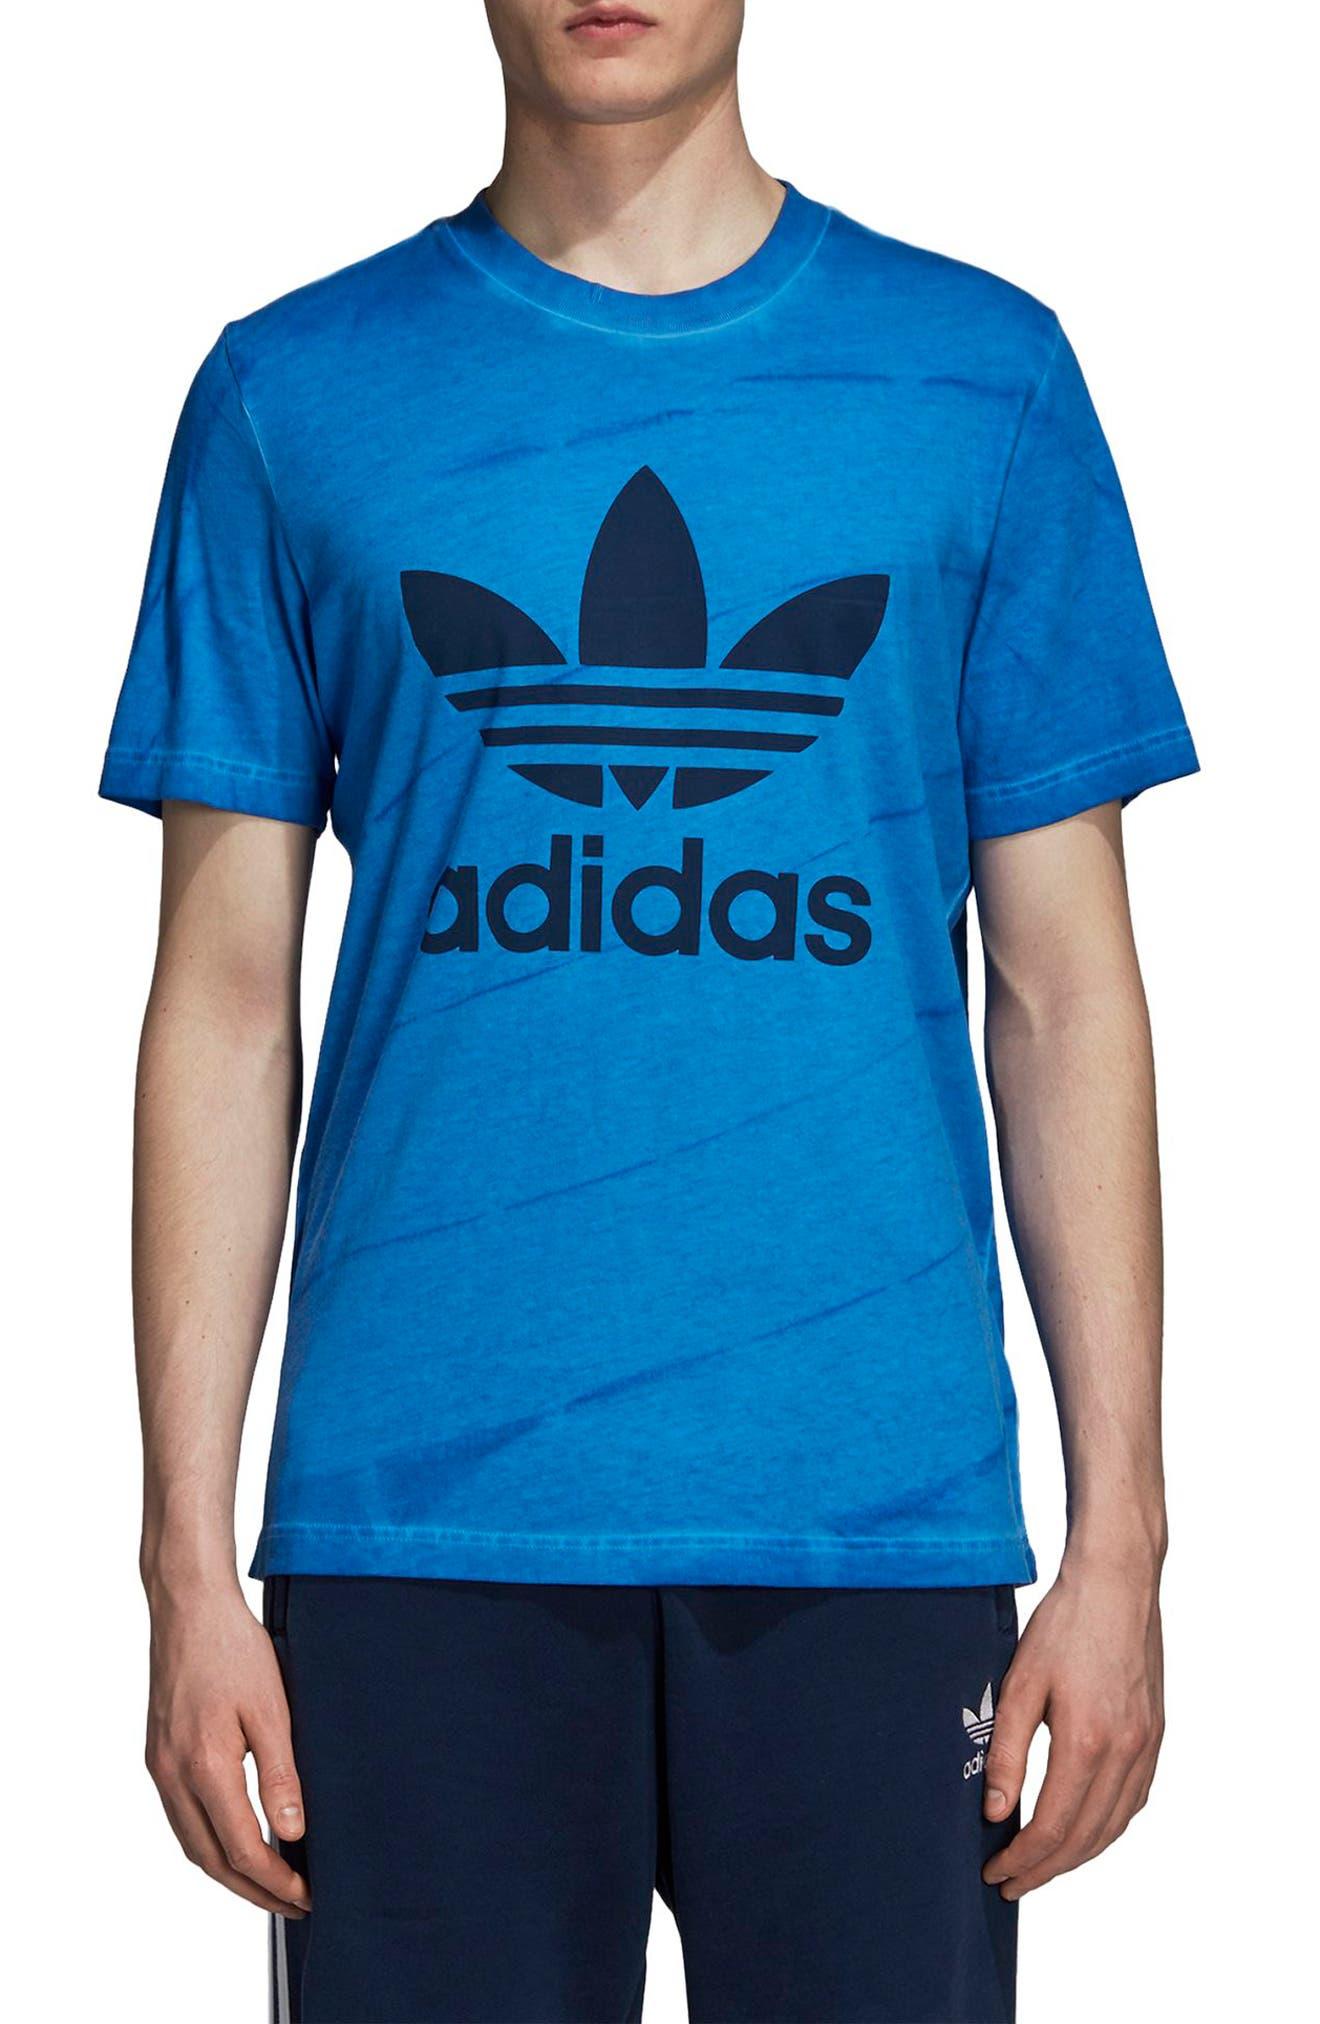 adidas Tie Dye T-Shirt,                             Main thumbnail 1, color,                             Bluebird